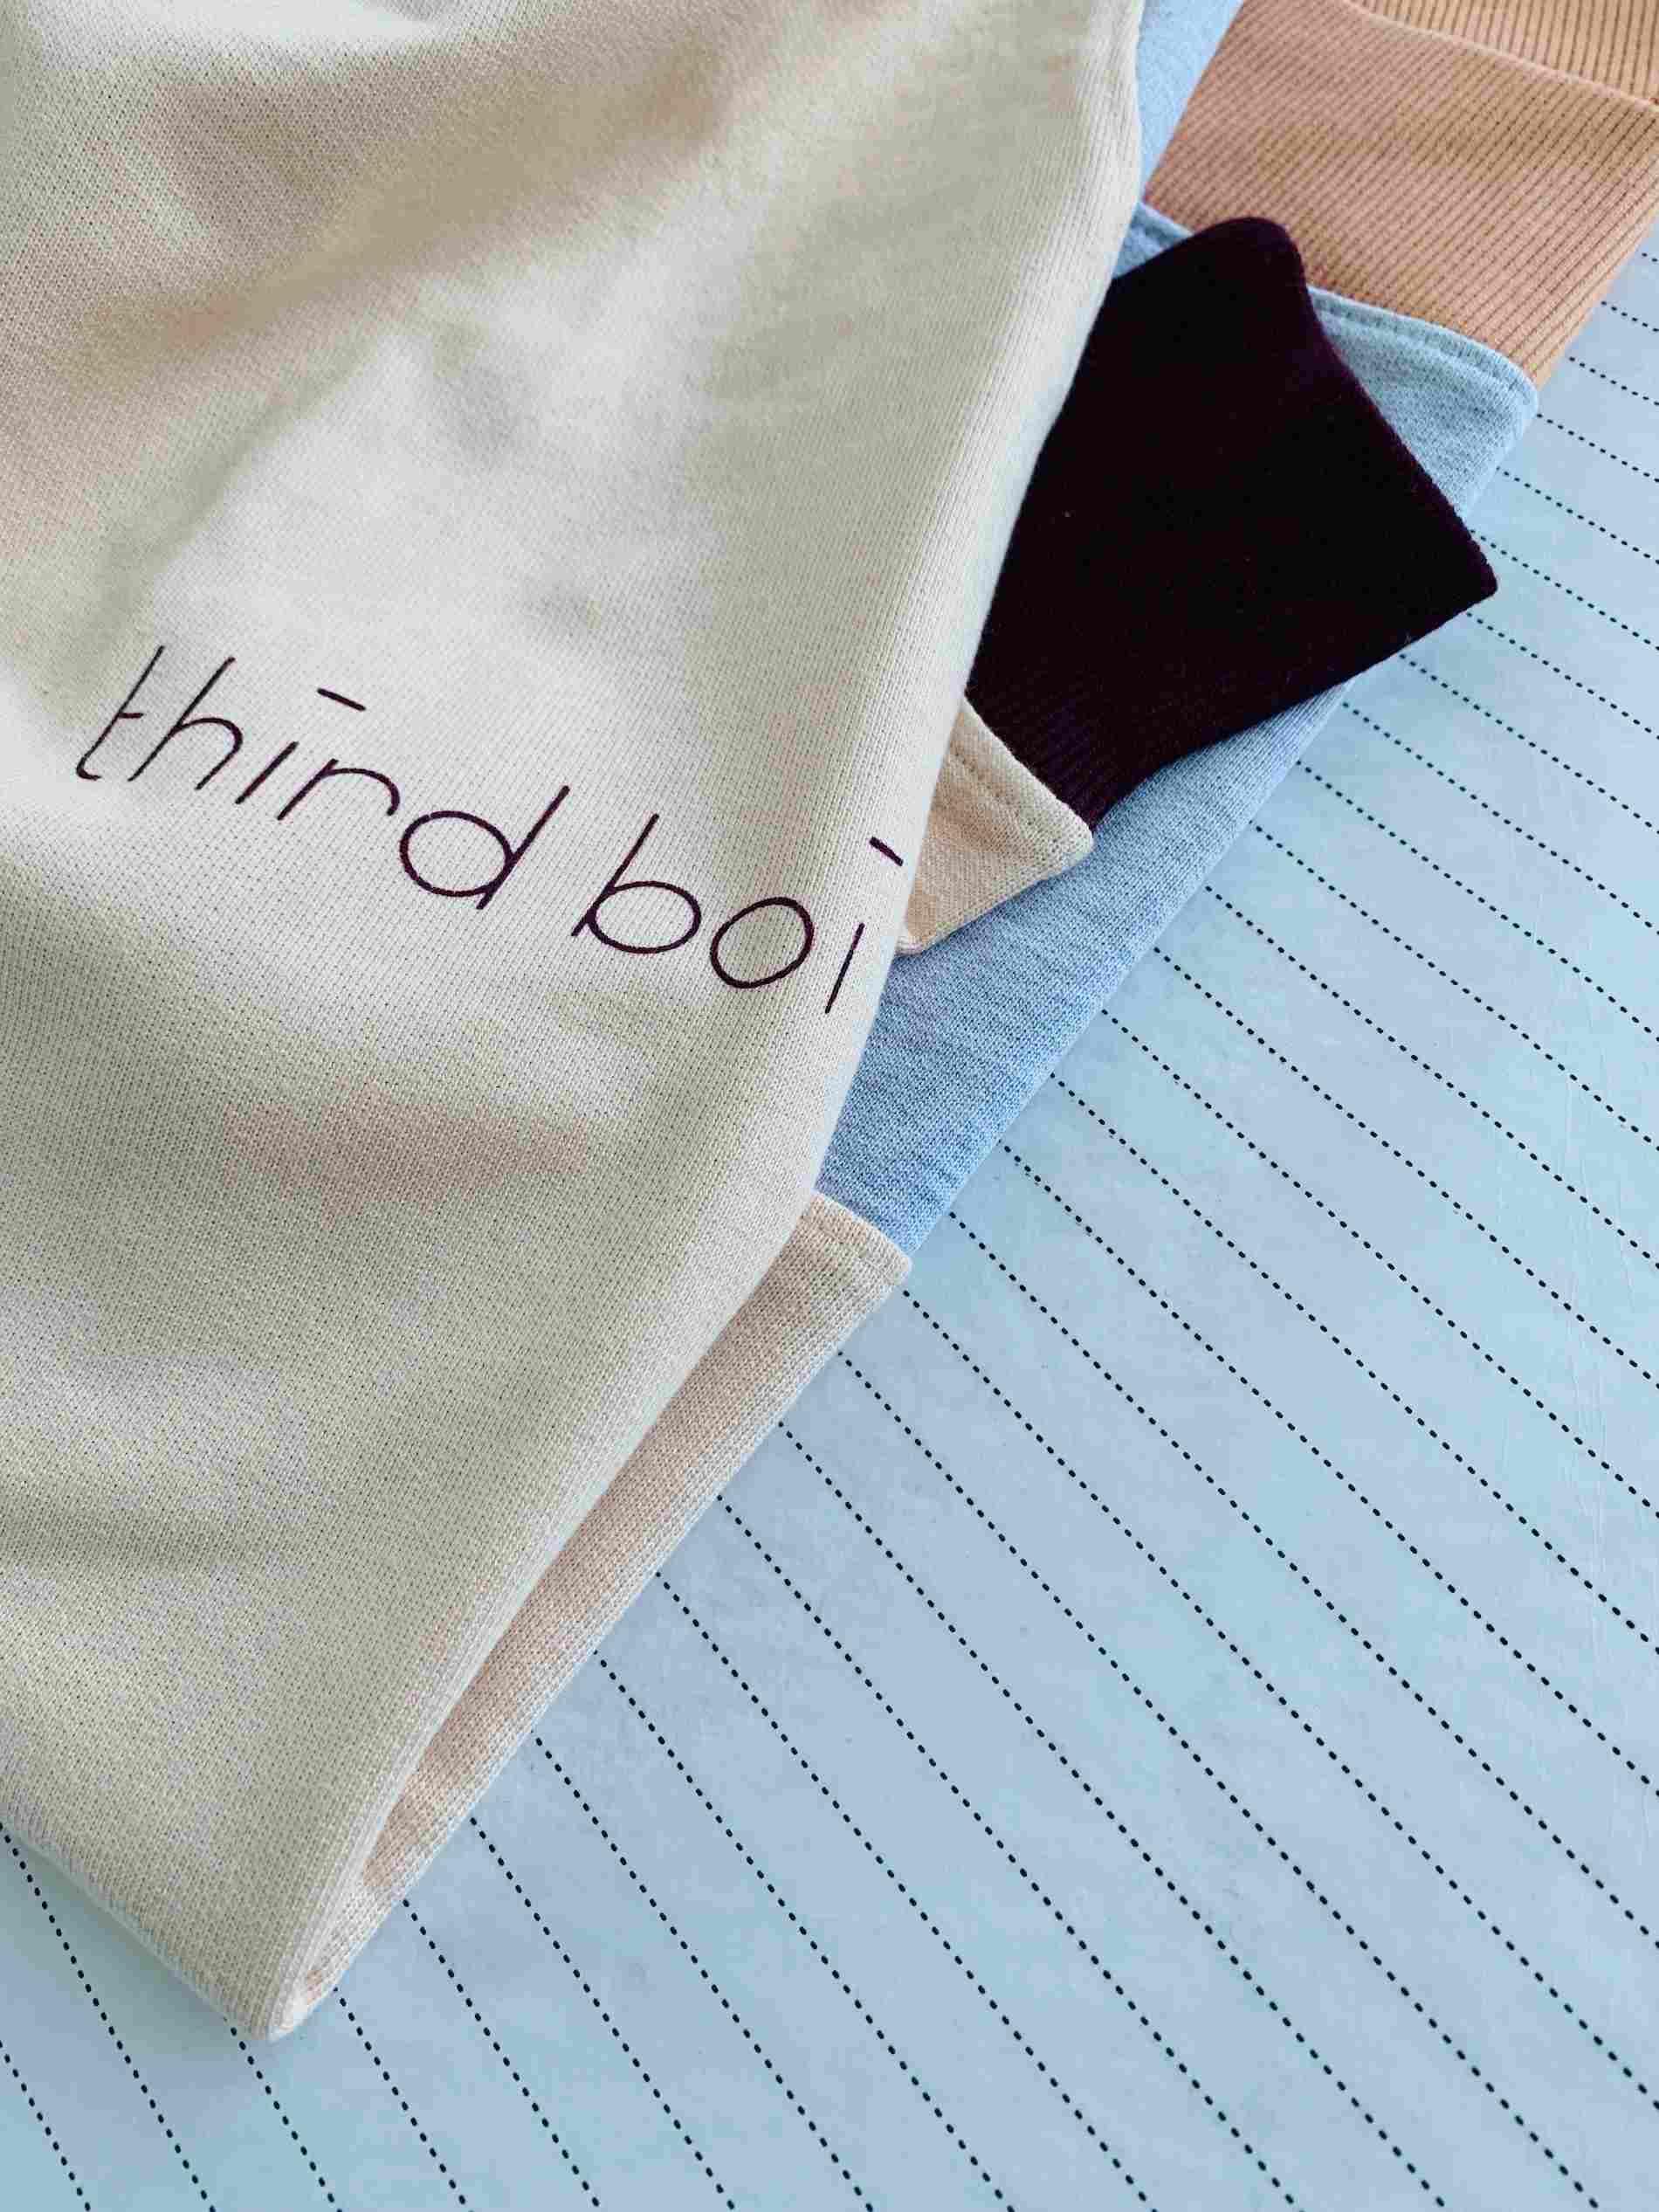 Third Boi custom tissue paper